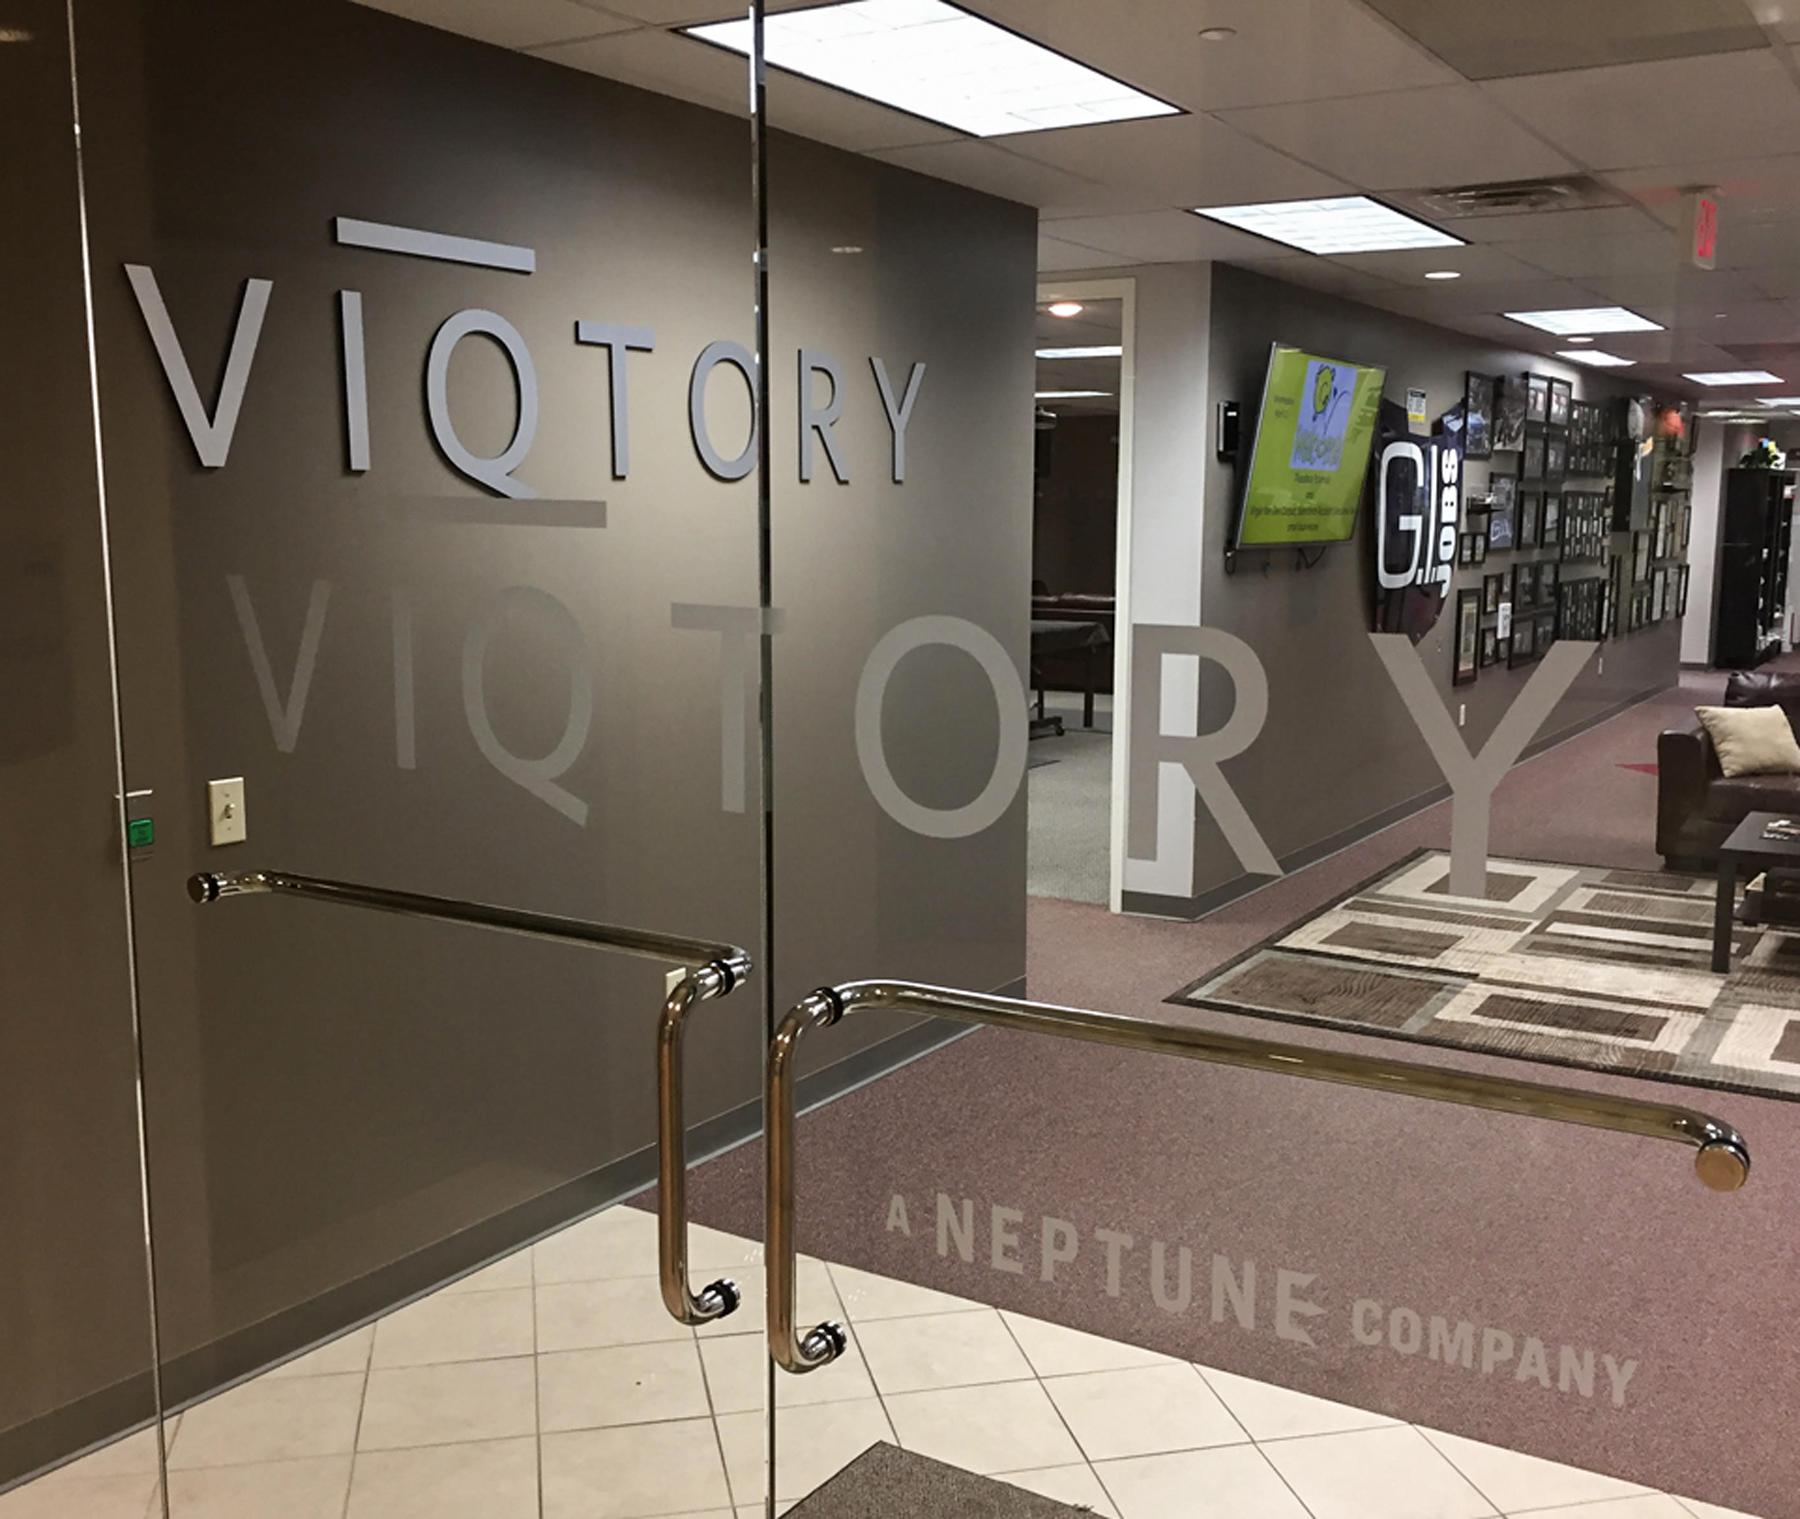 Viqtory Front Doors